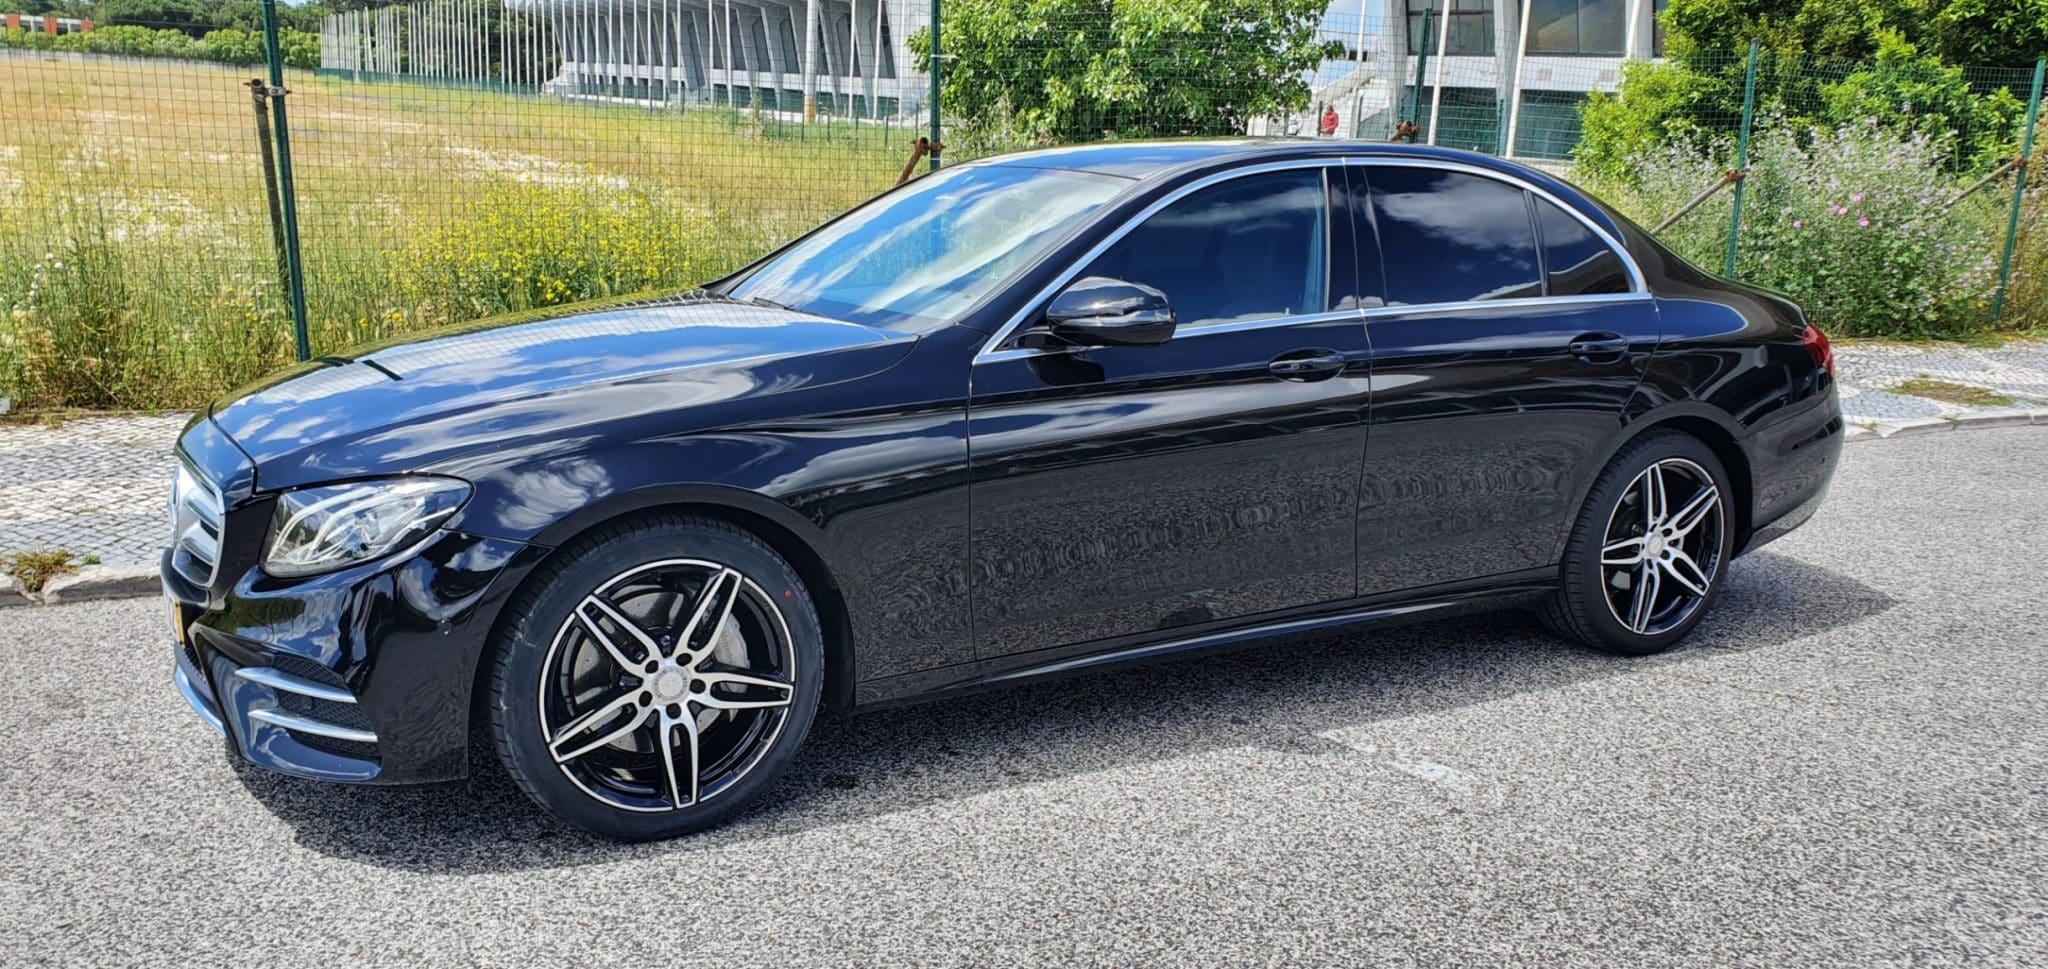 Mercedes-Benz E-Class taxitours airport transfers